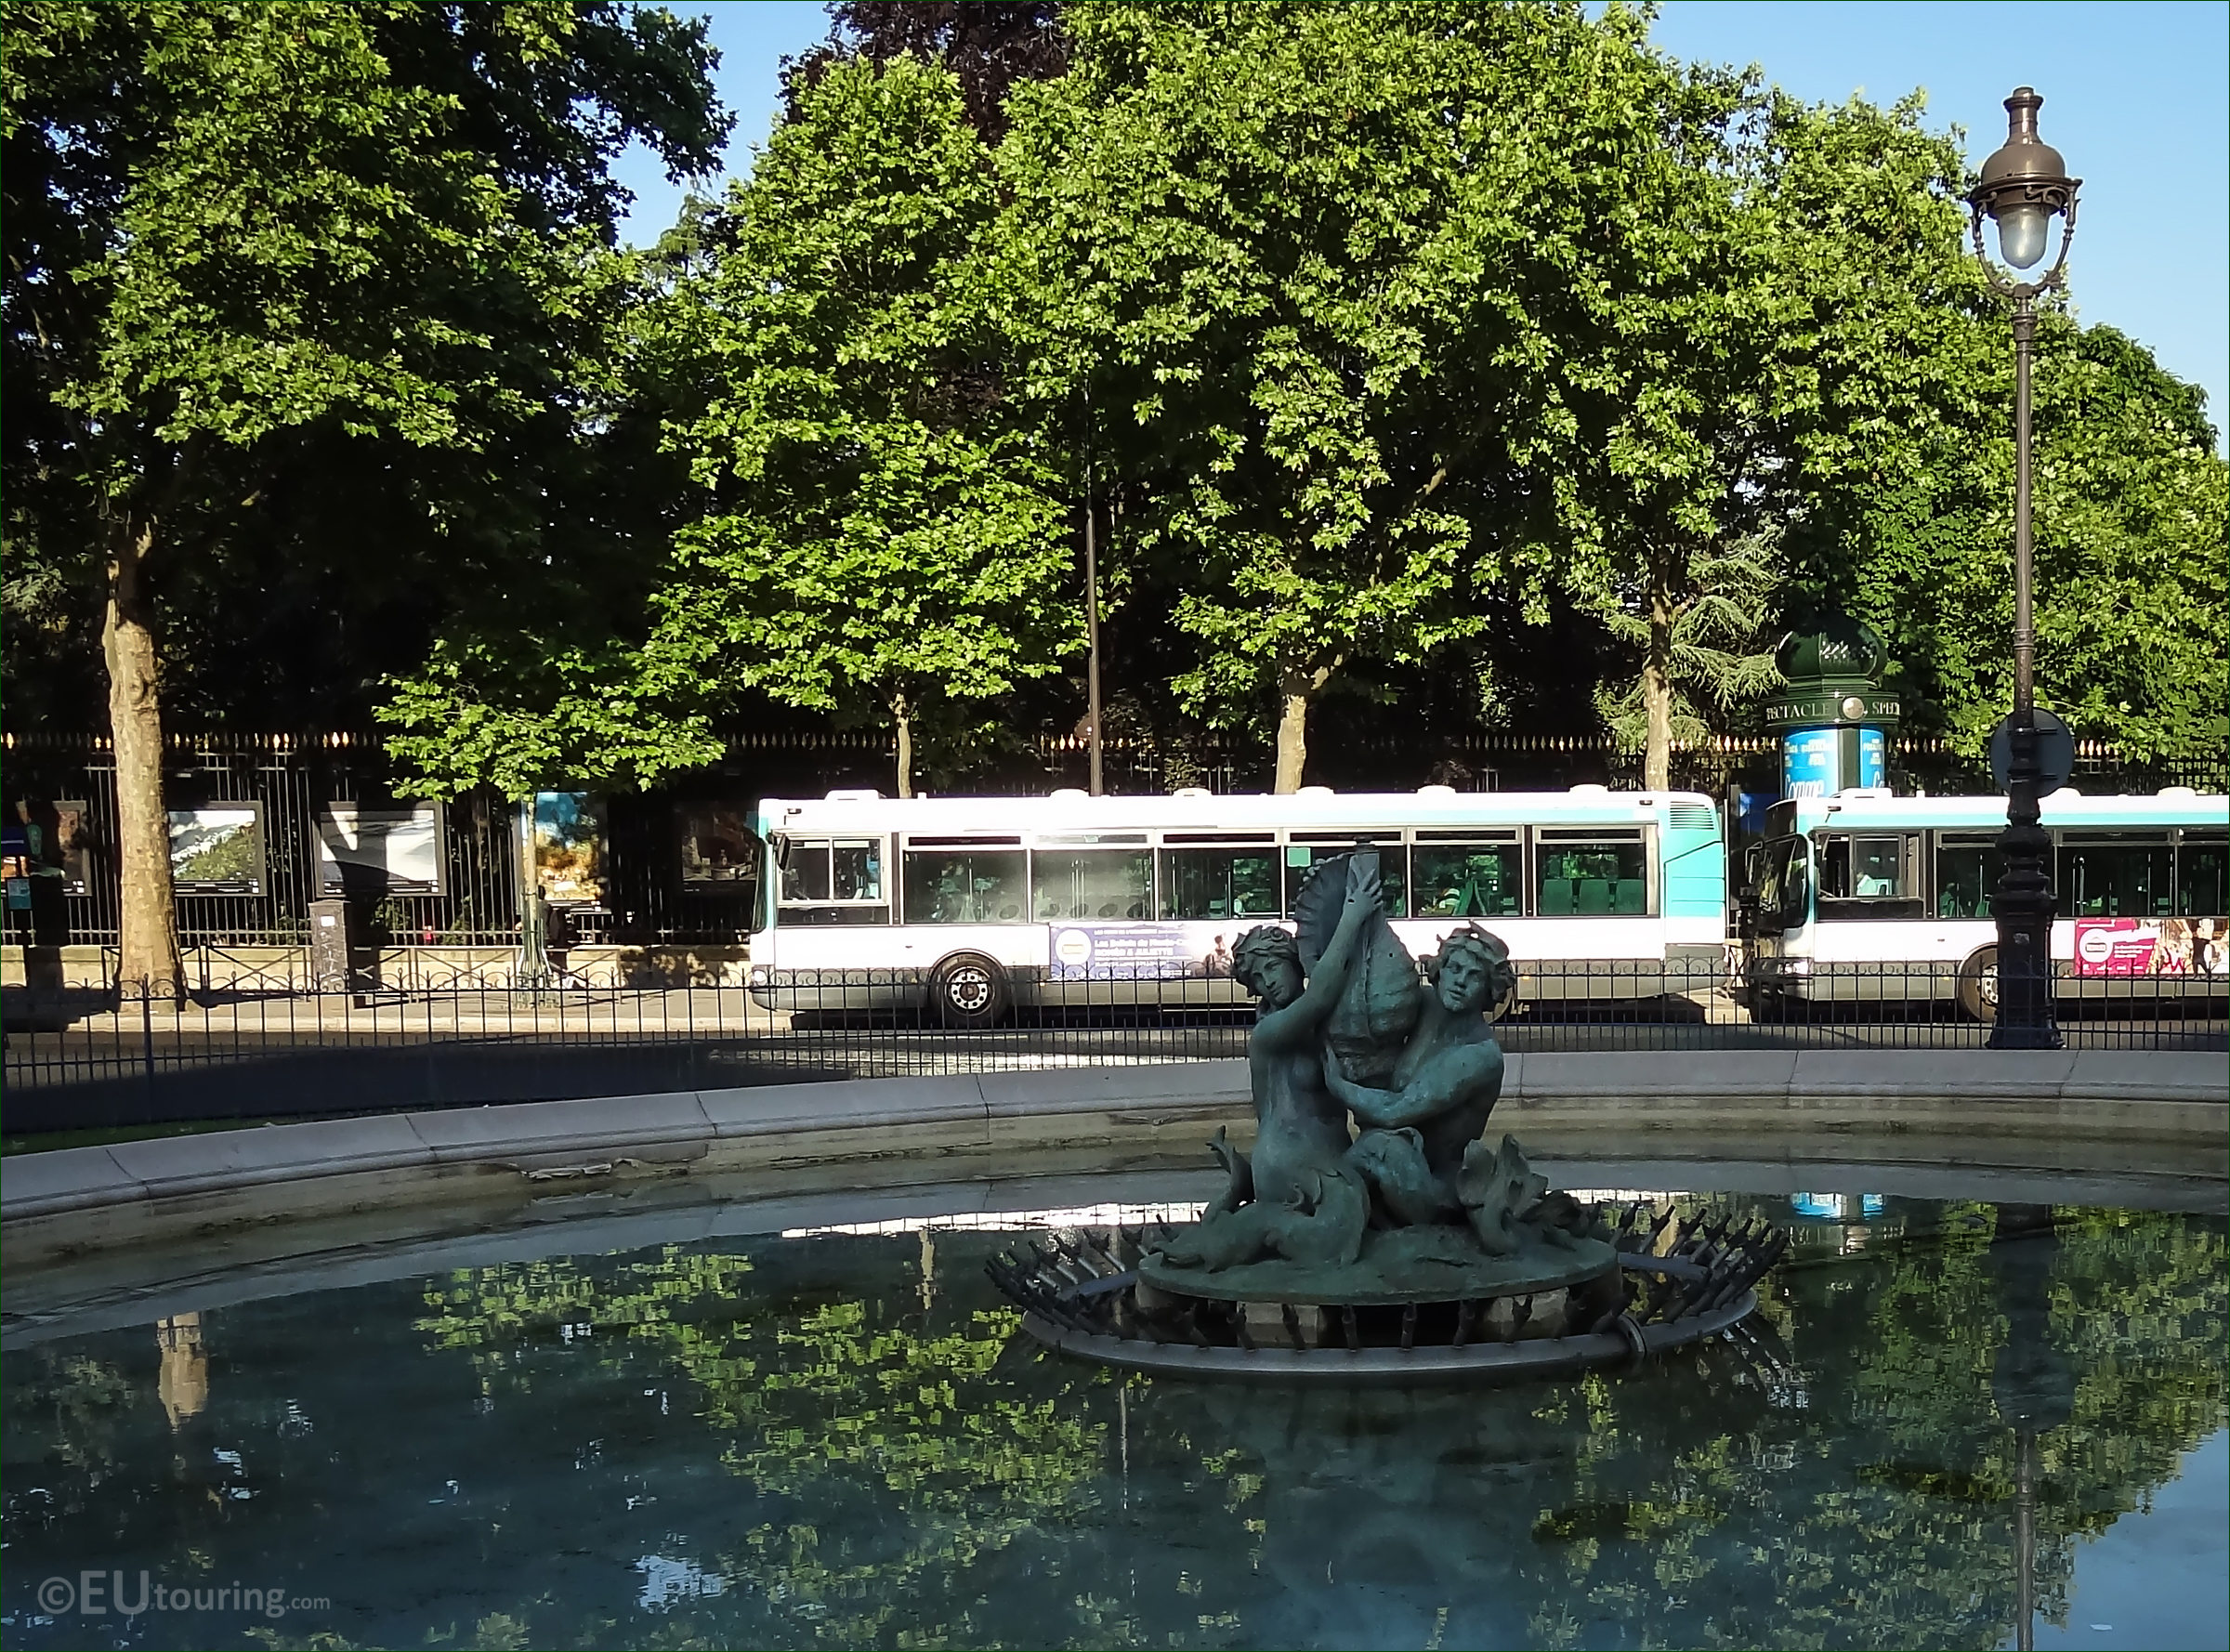 Bassin Fontaine De Jardin fontaine du bassin soufflot statue at place edmond rostand